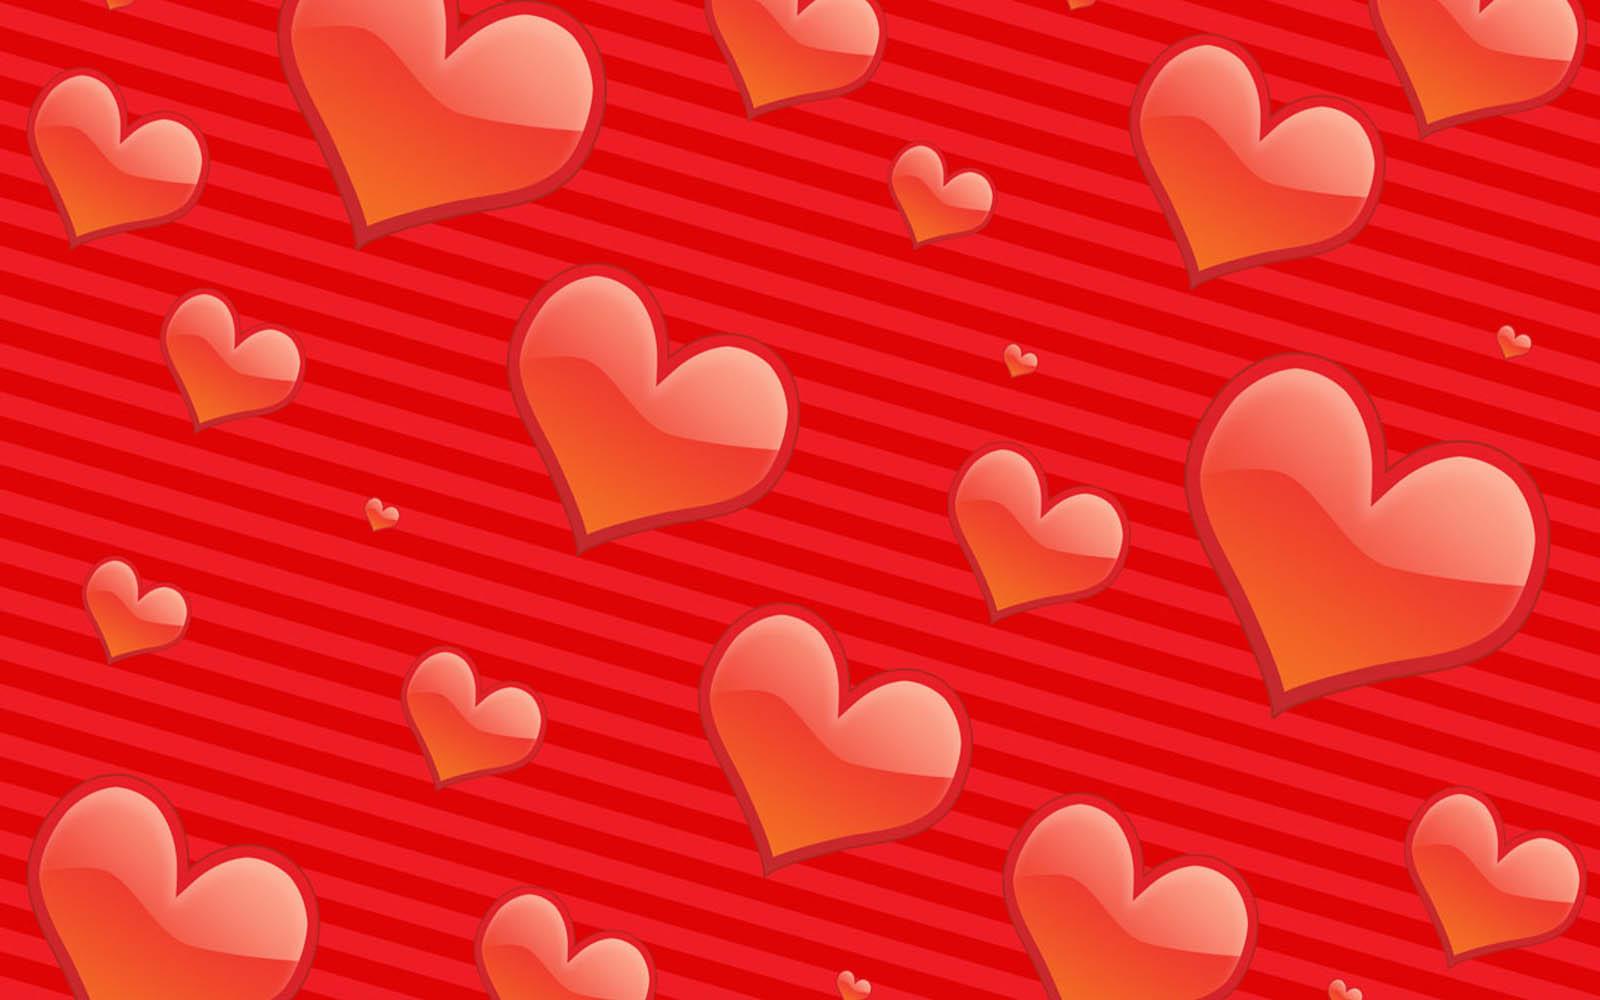 Cute love symbols images gallery symbol and sign ideas cute baby hd wallpaper love symbol love symbol buycottarizona biocorpaavc